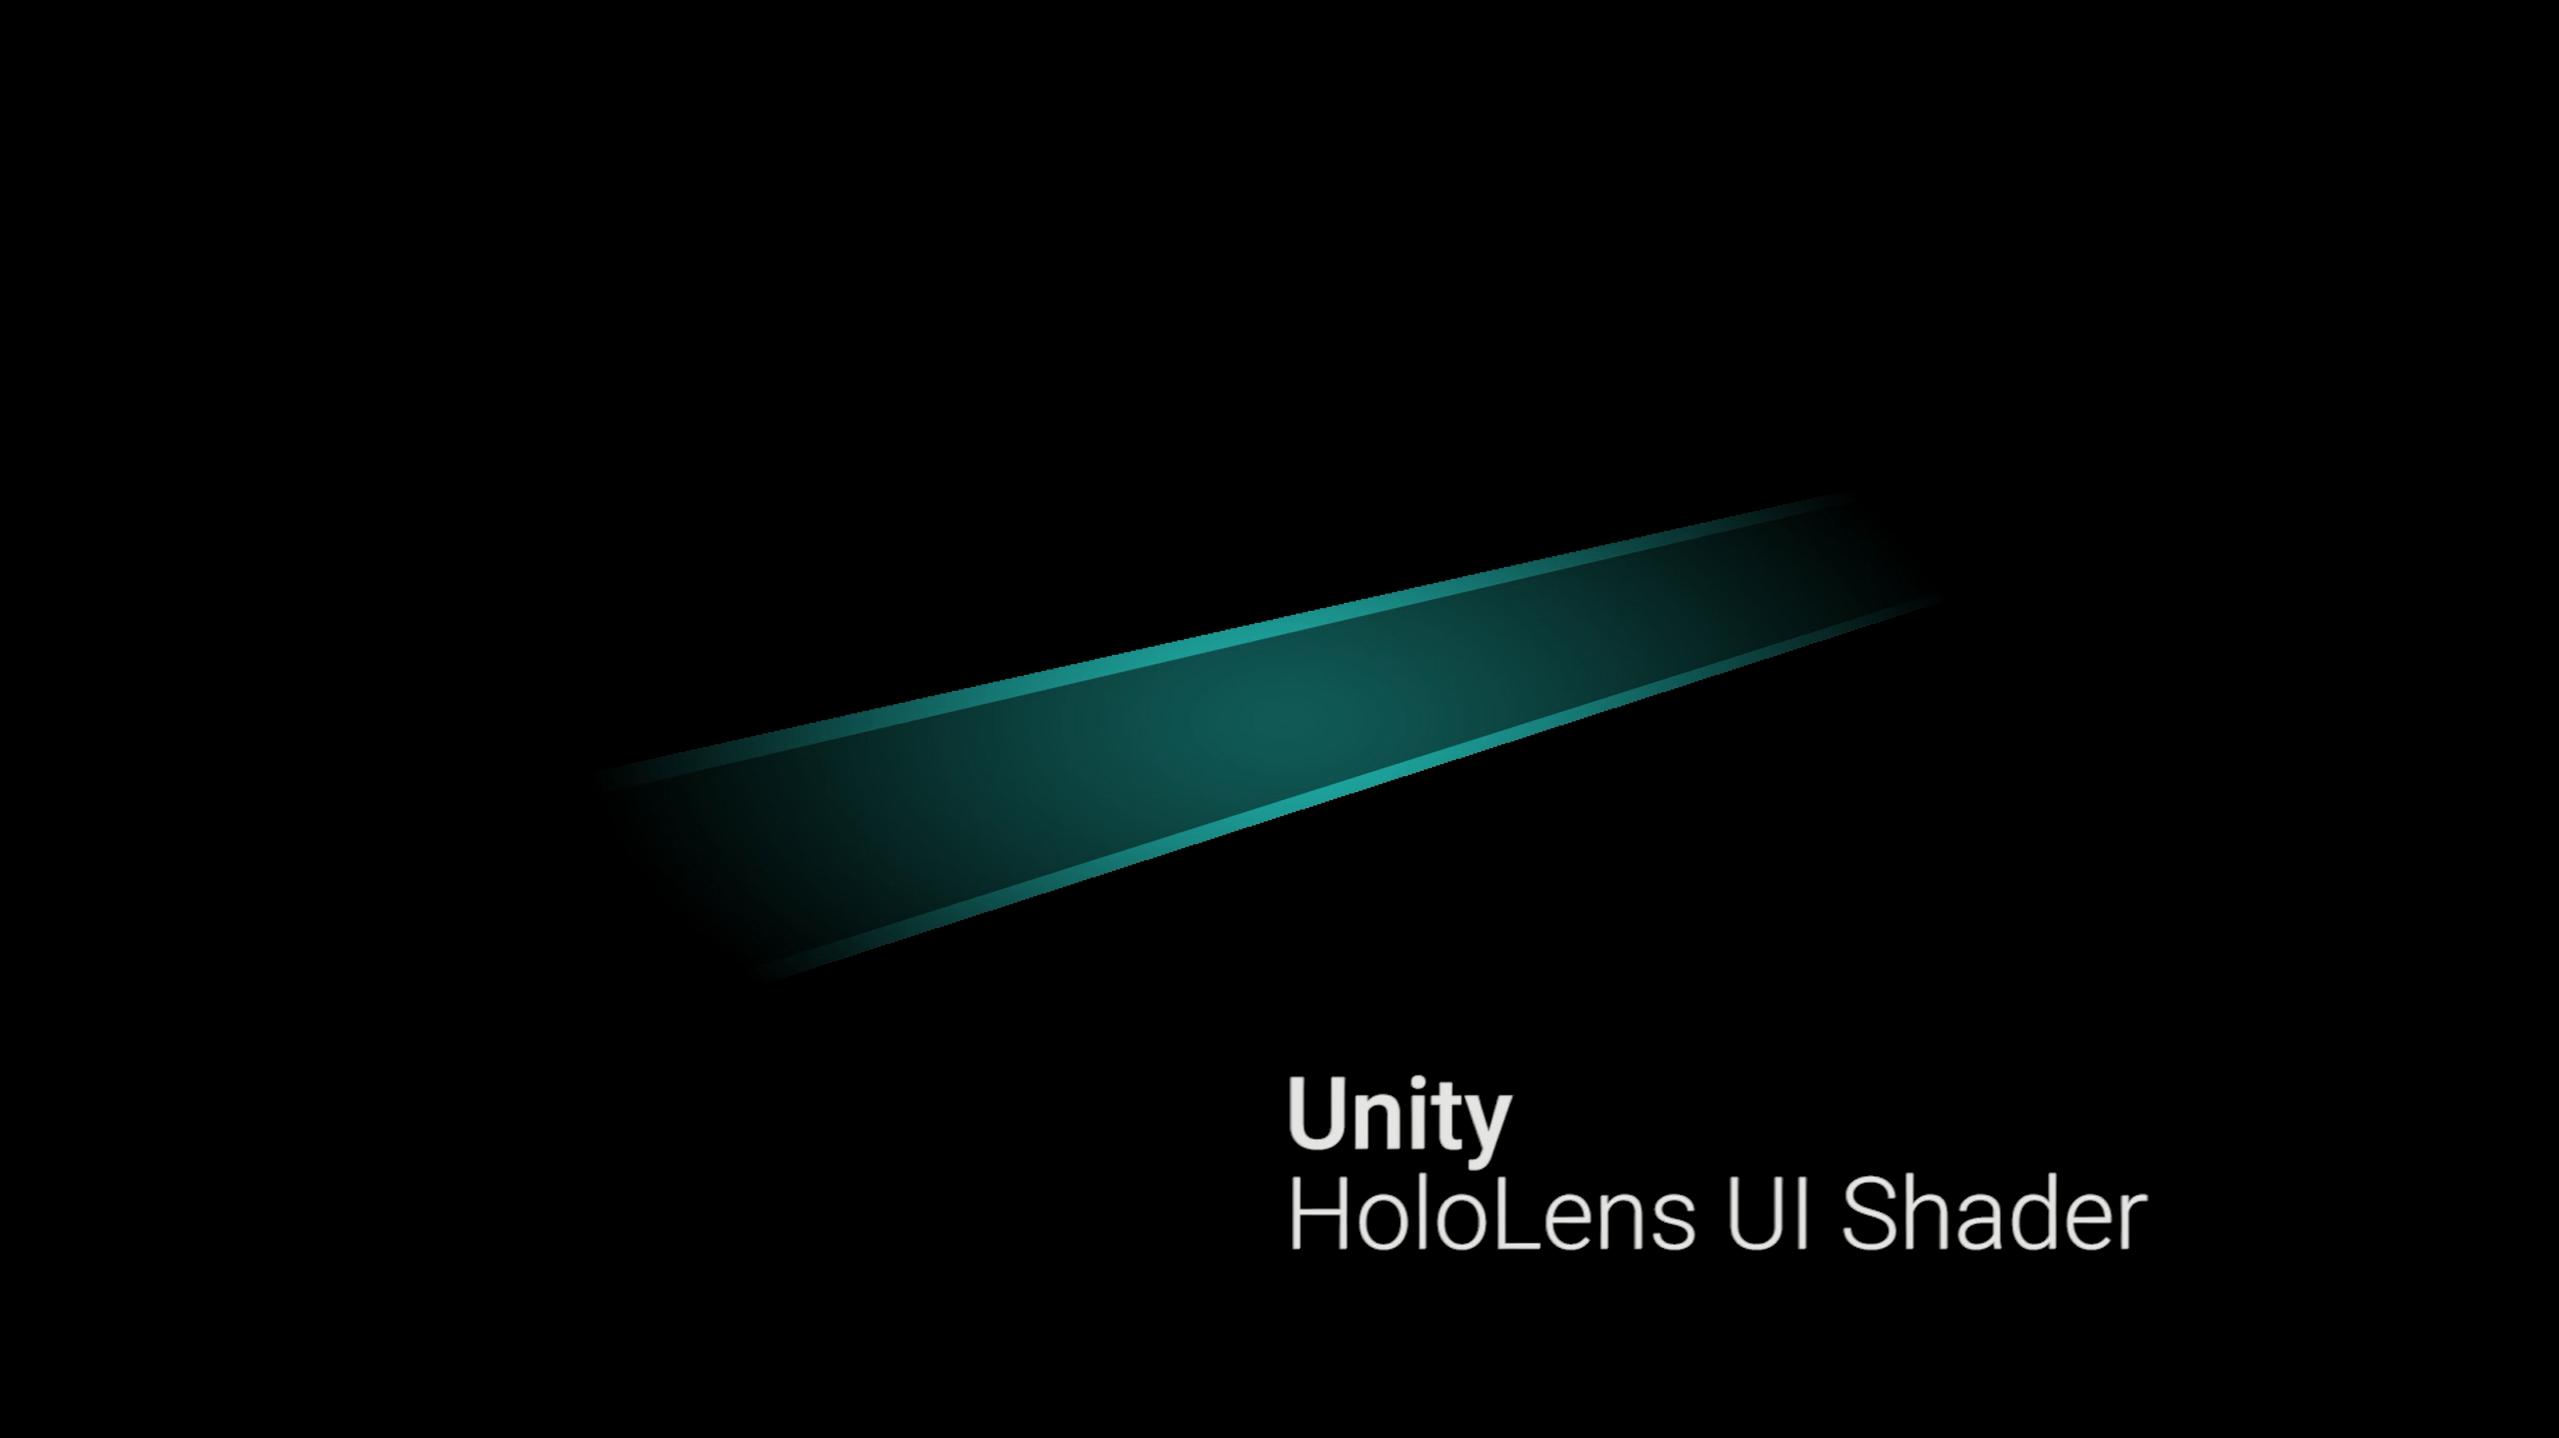 MSUI - Unity HoloLens UI Shader